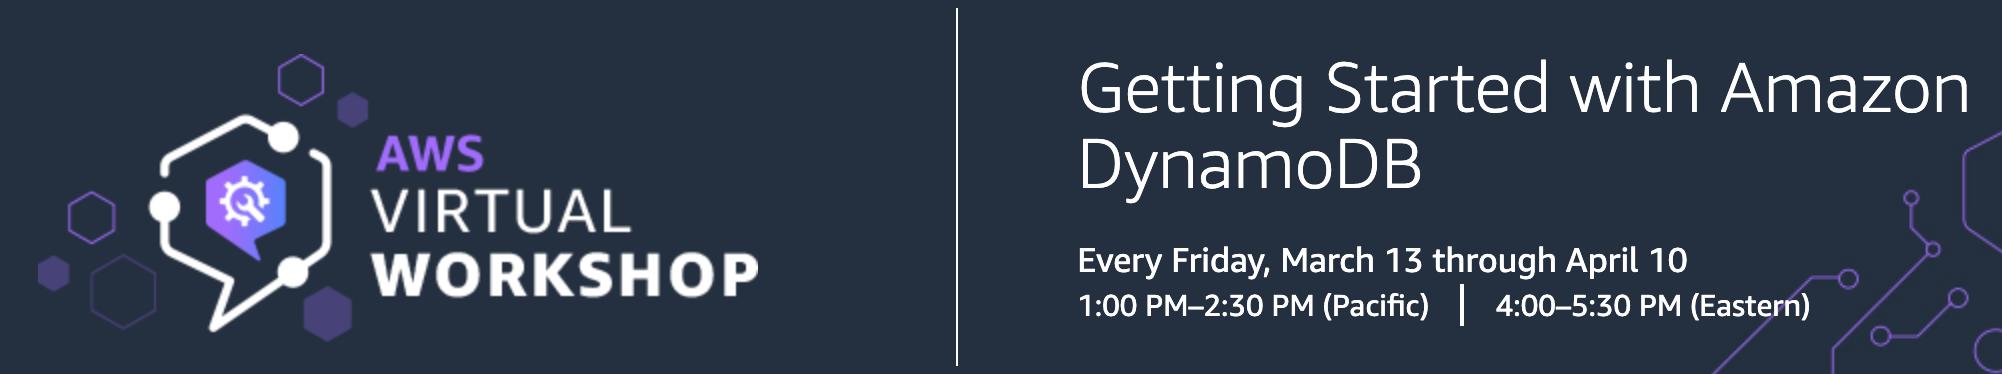 AWS Virtual Workshop: Getting Started with Amazon DynamoDB